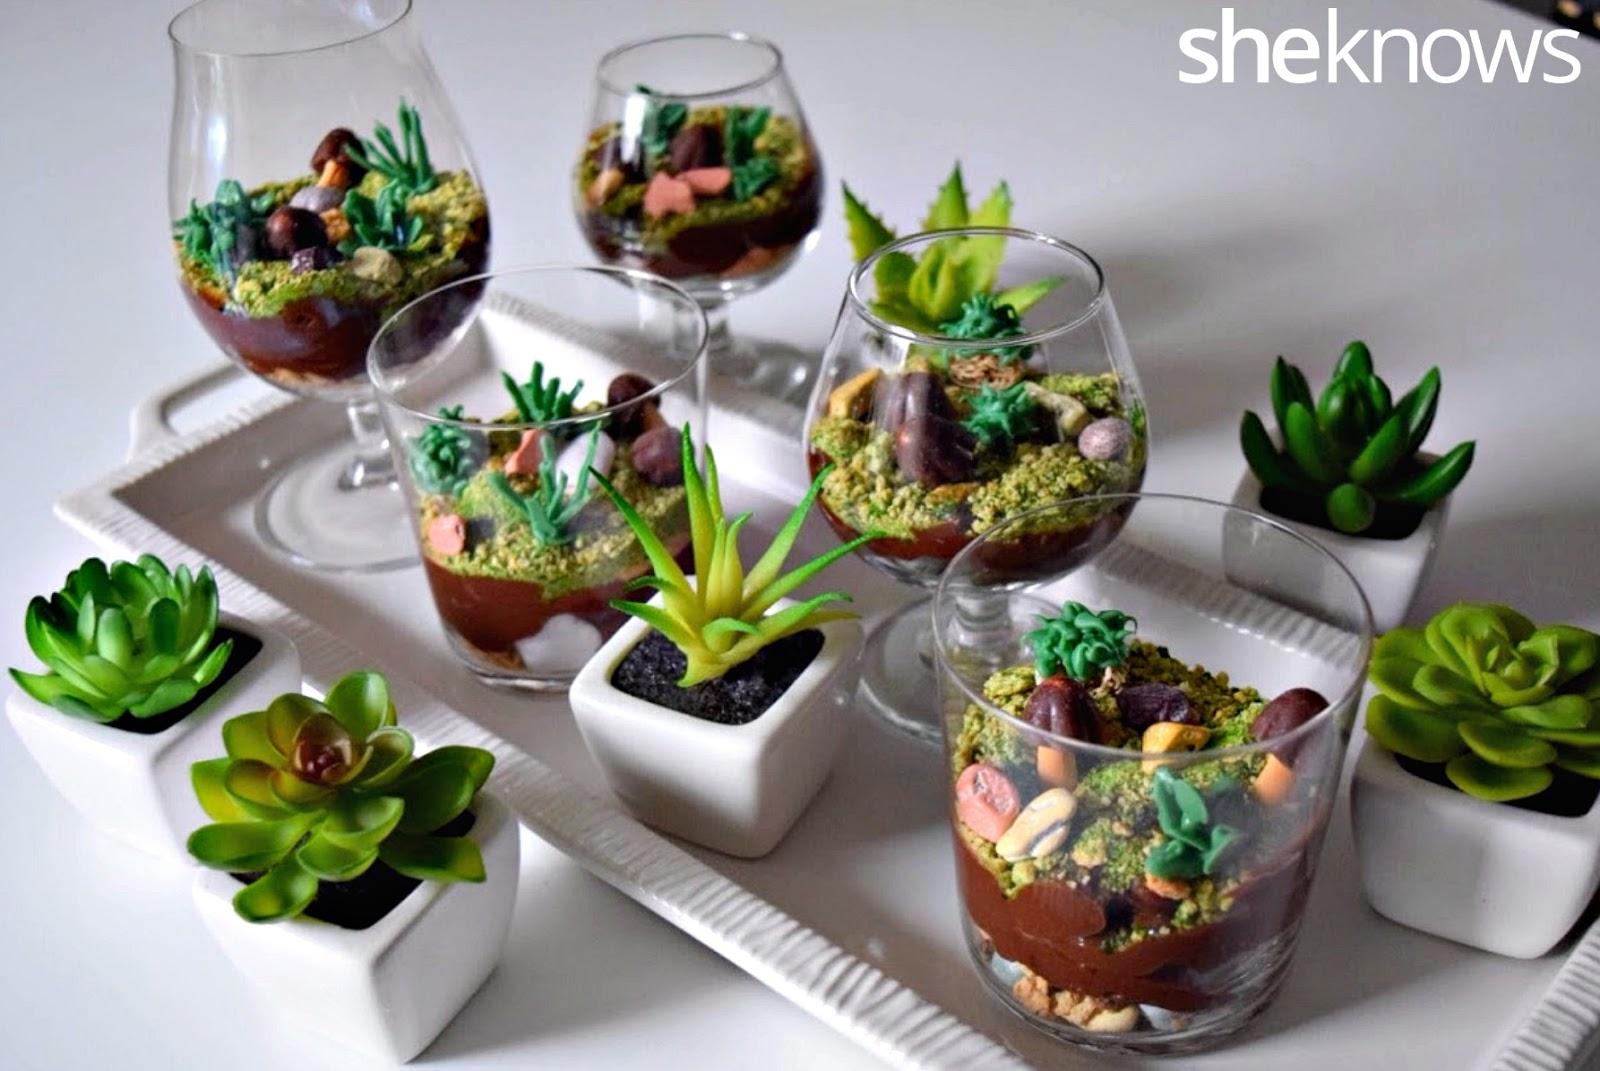 Sugar Swings! Serve Some: All Edible Terrarium Pudding Cups